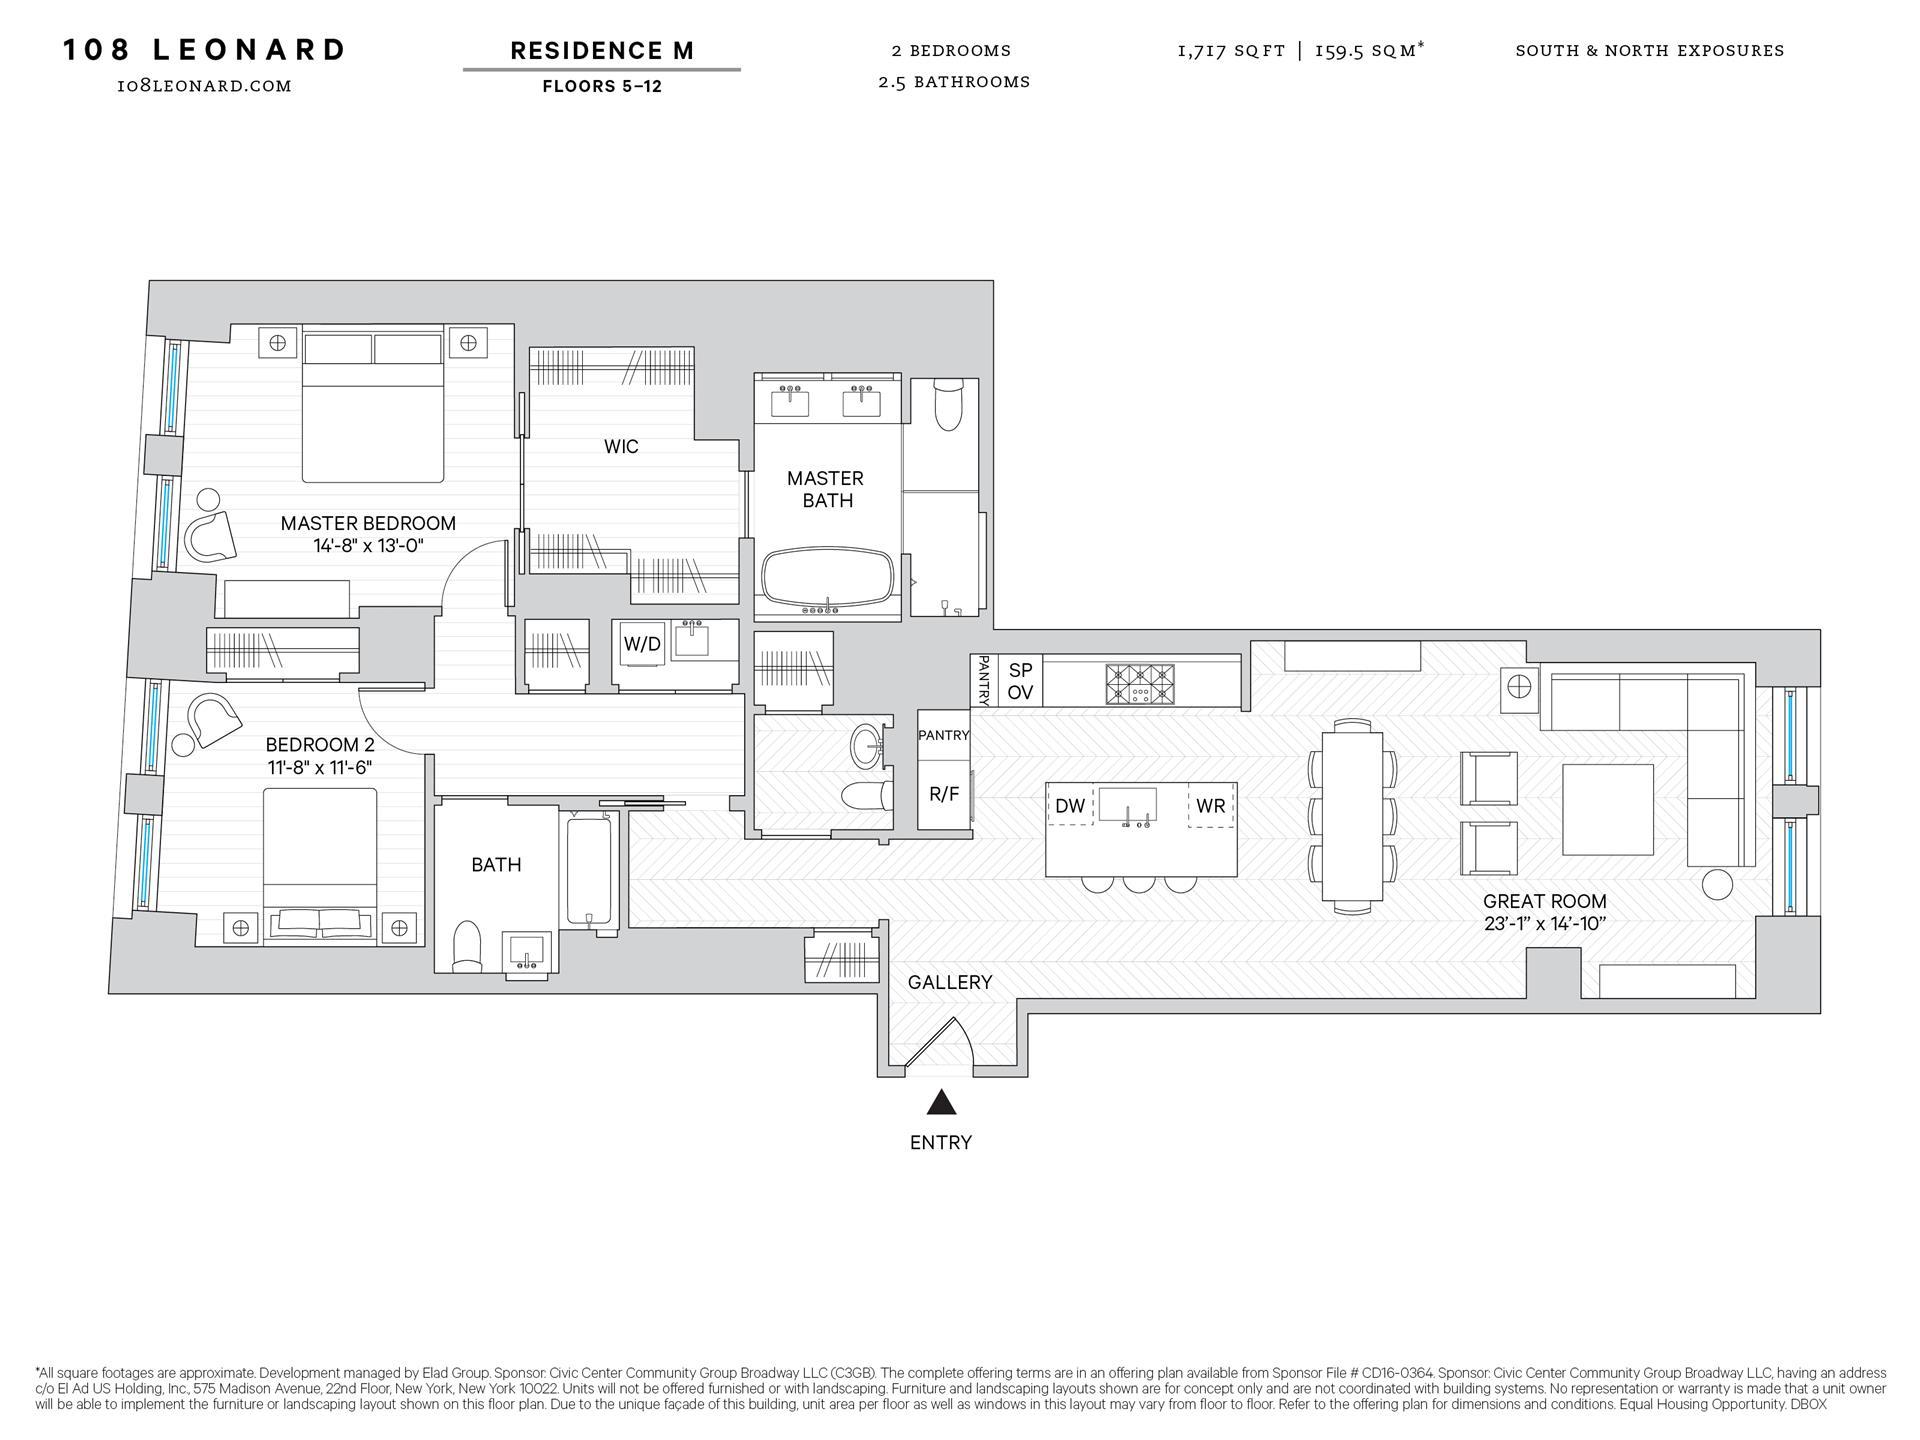 Floor plan of 108 Leonard St, 5M - TriBeCa, New York